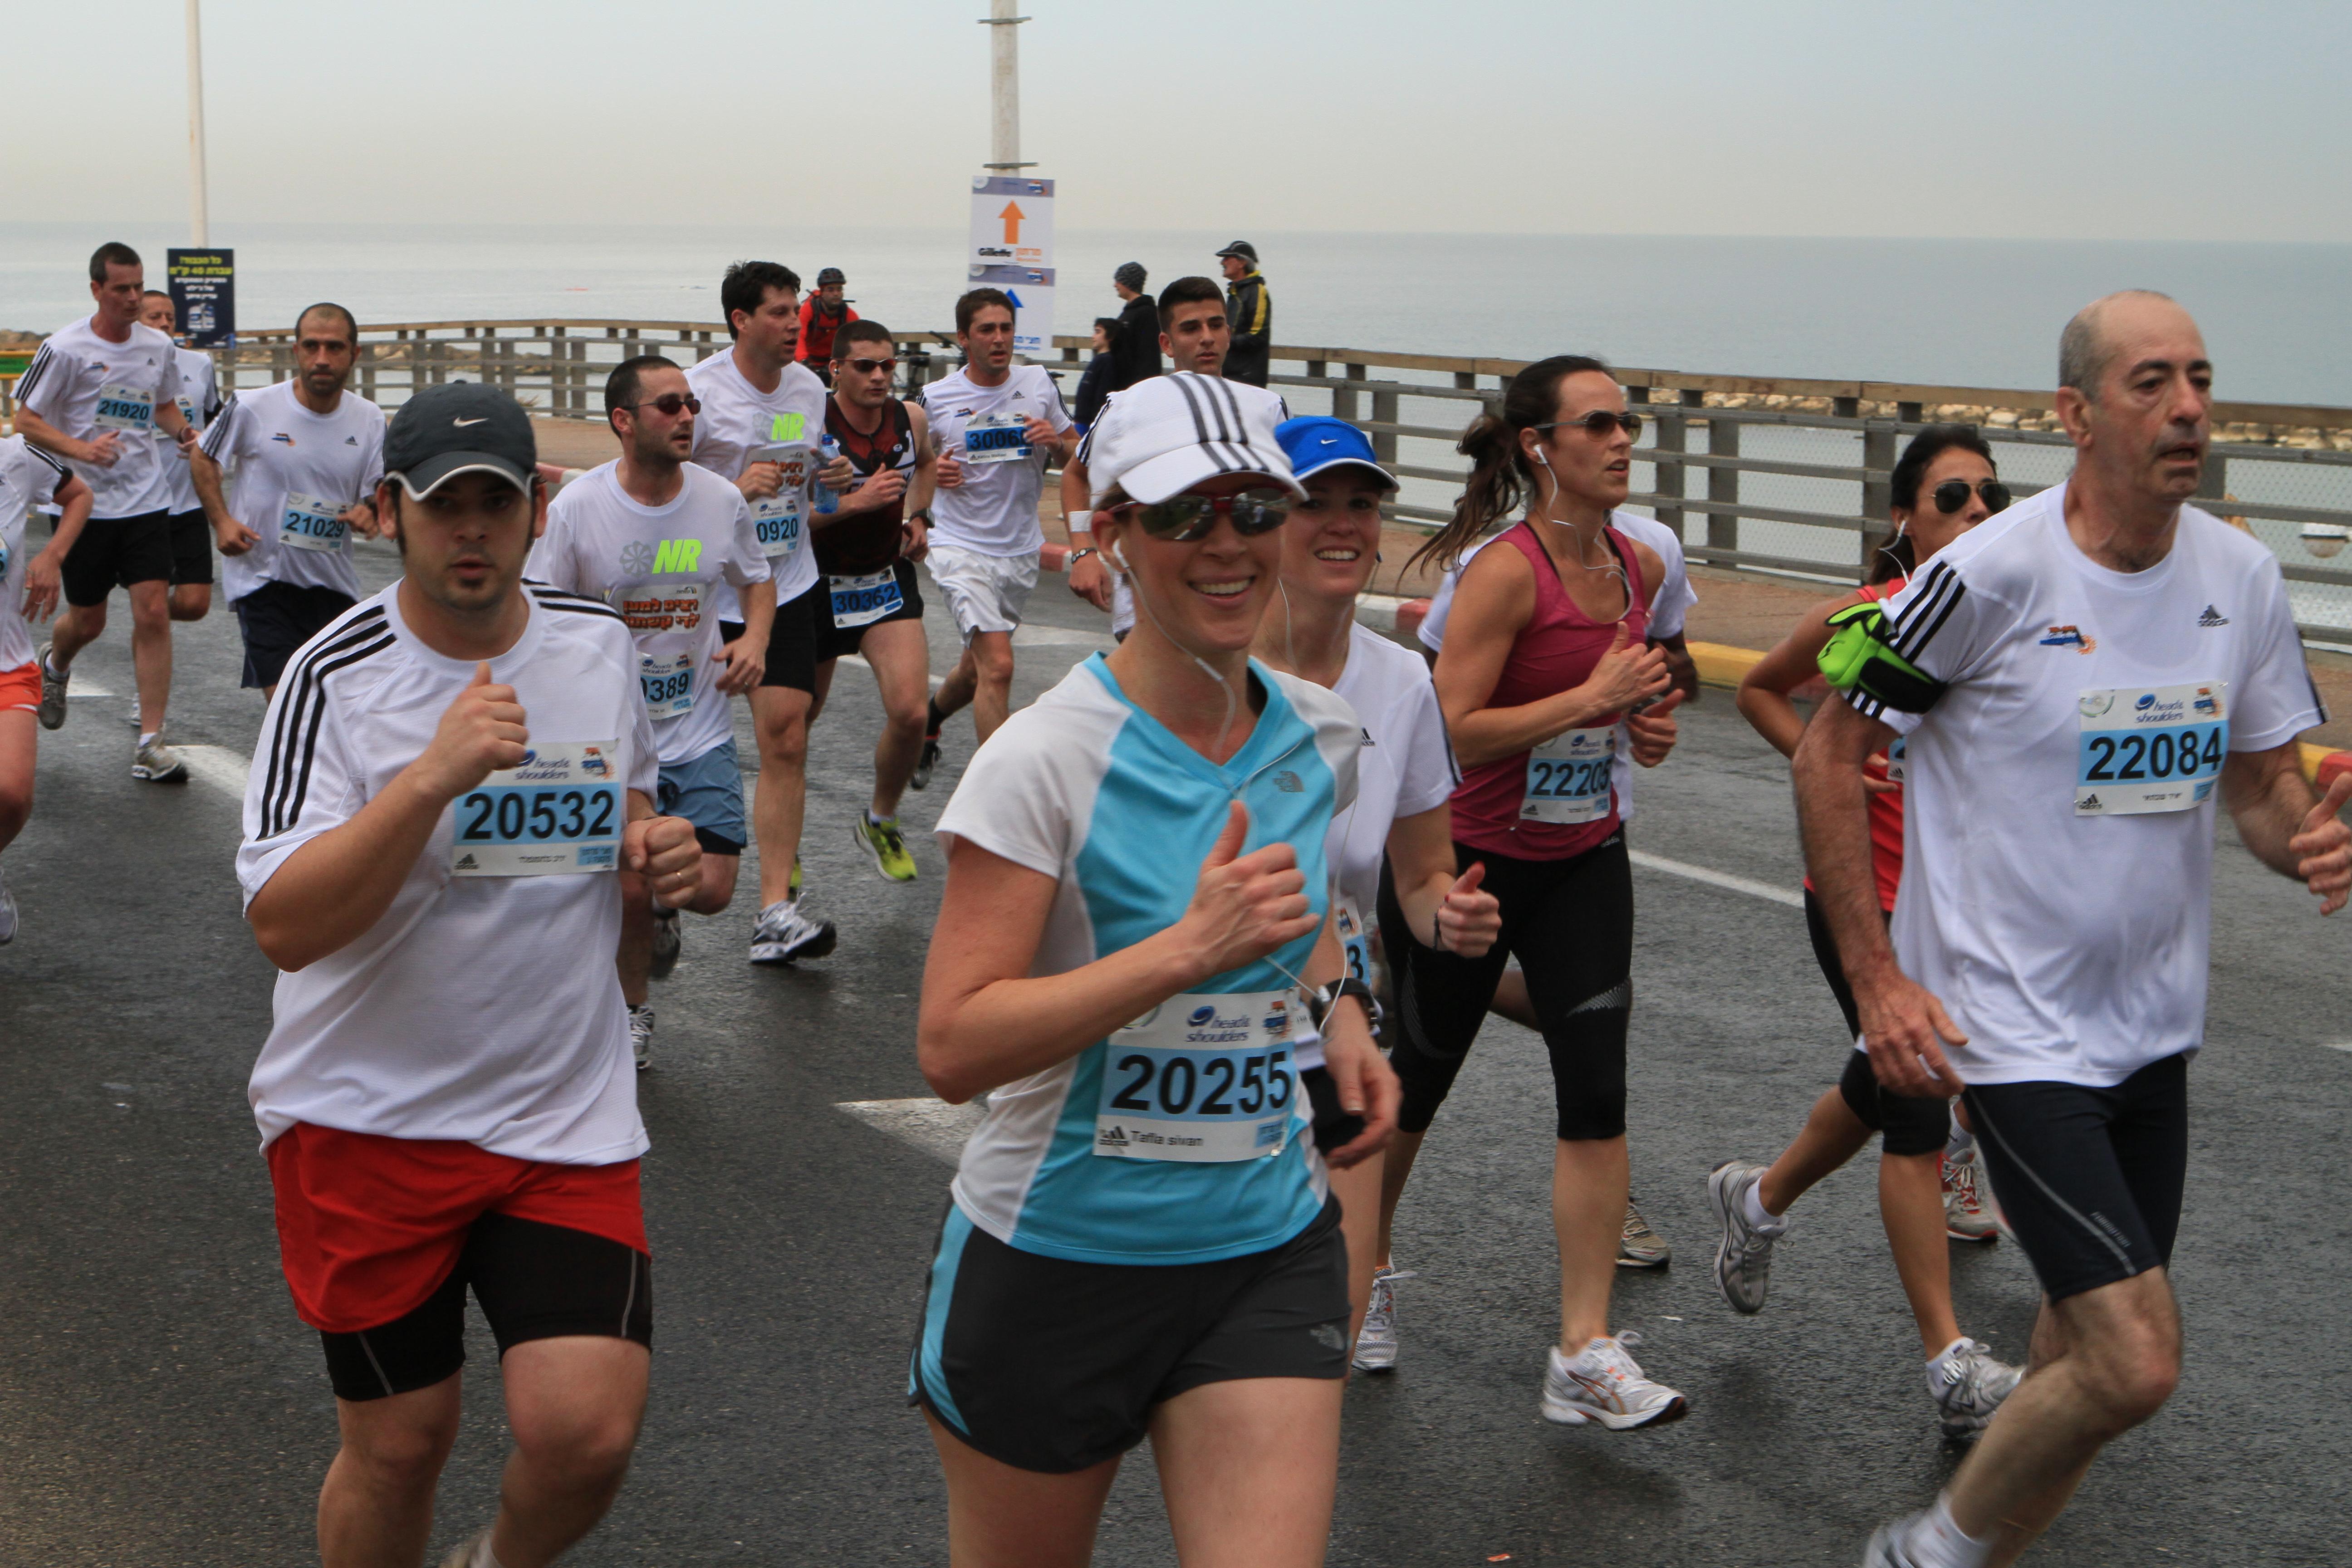 Jerusalem Marathon Wikipedia: File:Maraton Tel Aviv